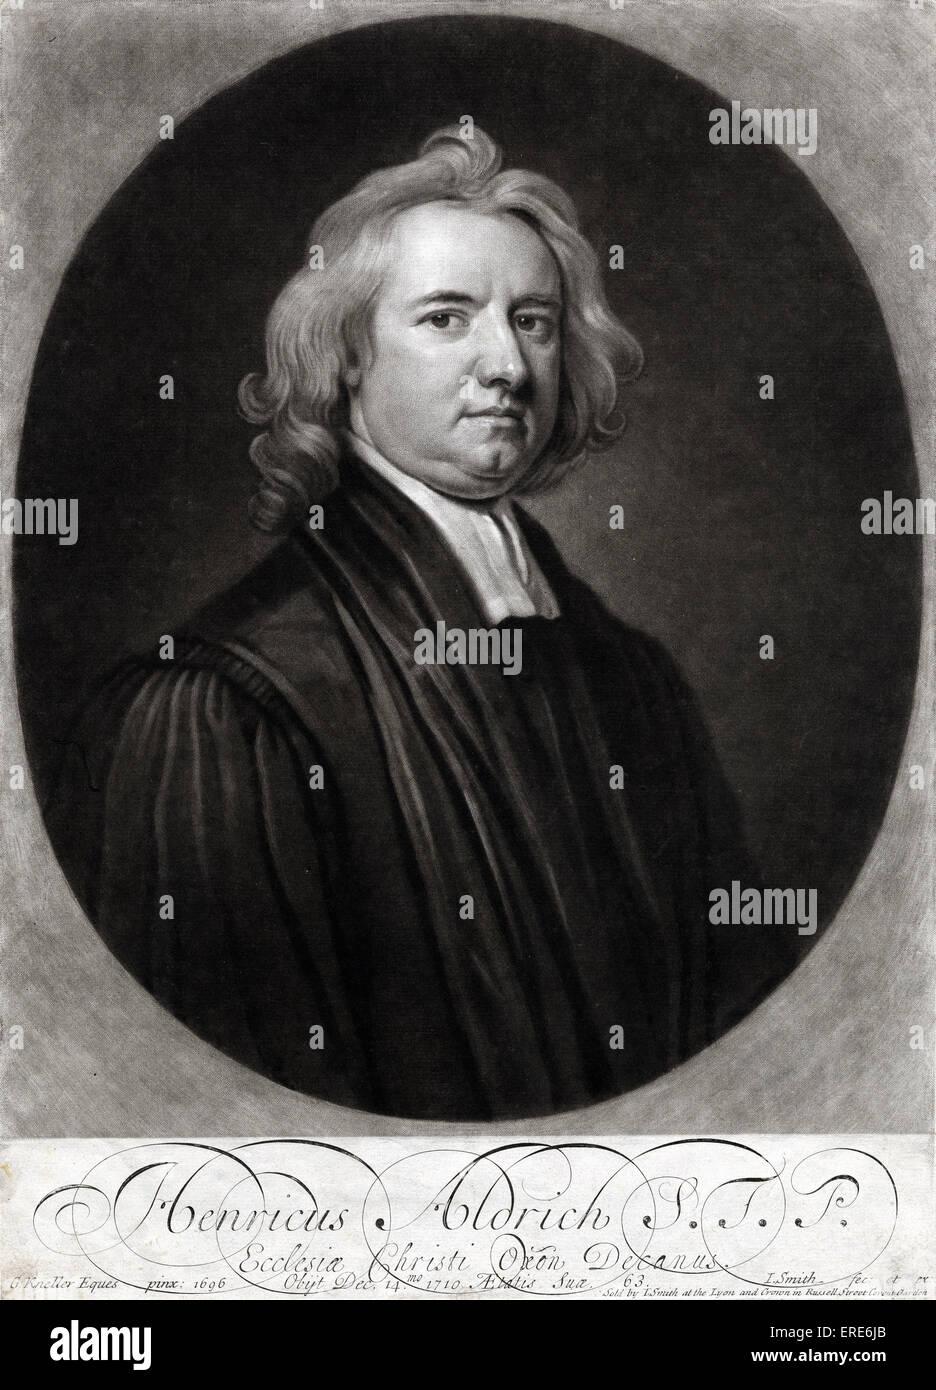 Henry Aldrich - Commemorative portrait of Henry Aldrich S.T.P., Ecclesia Christi Oxon. Decanus.Engraving by J. Smith - Stock Image